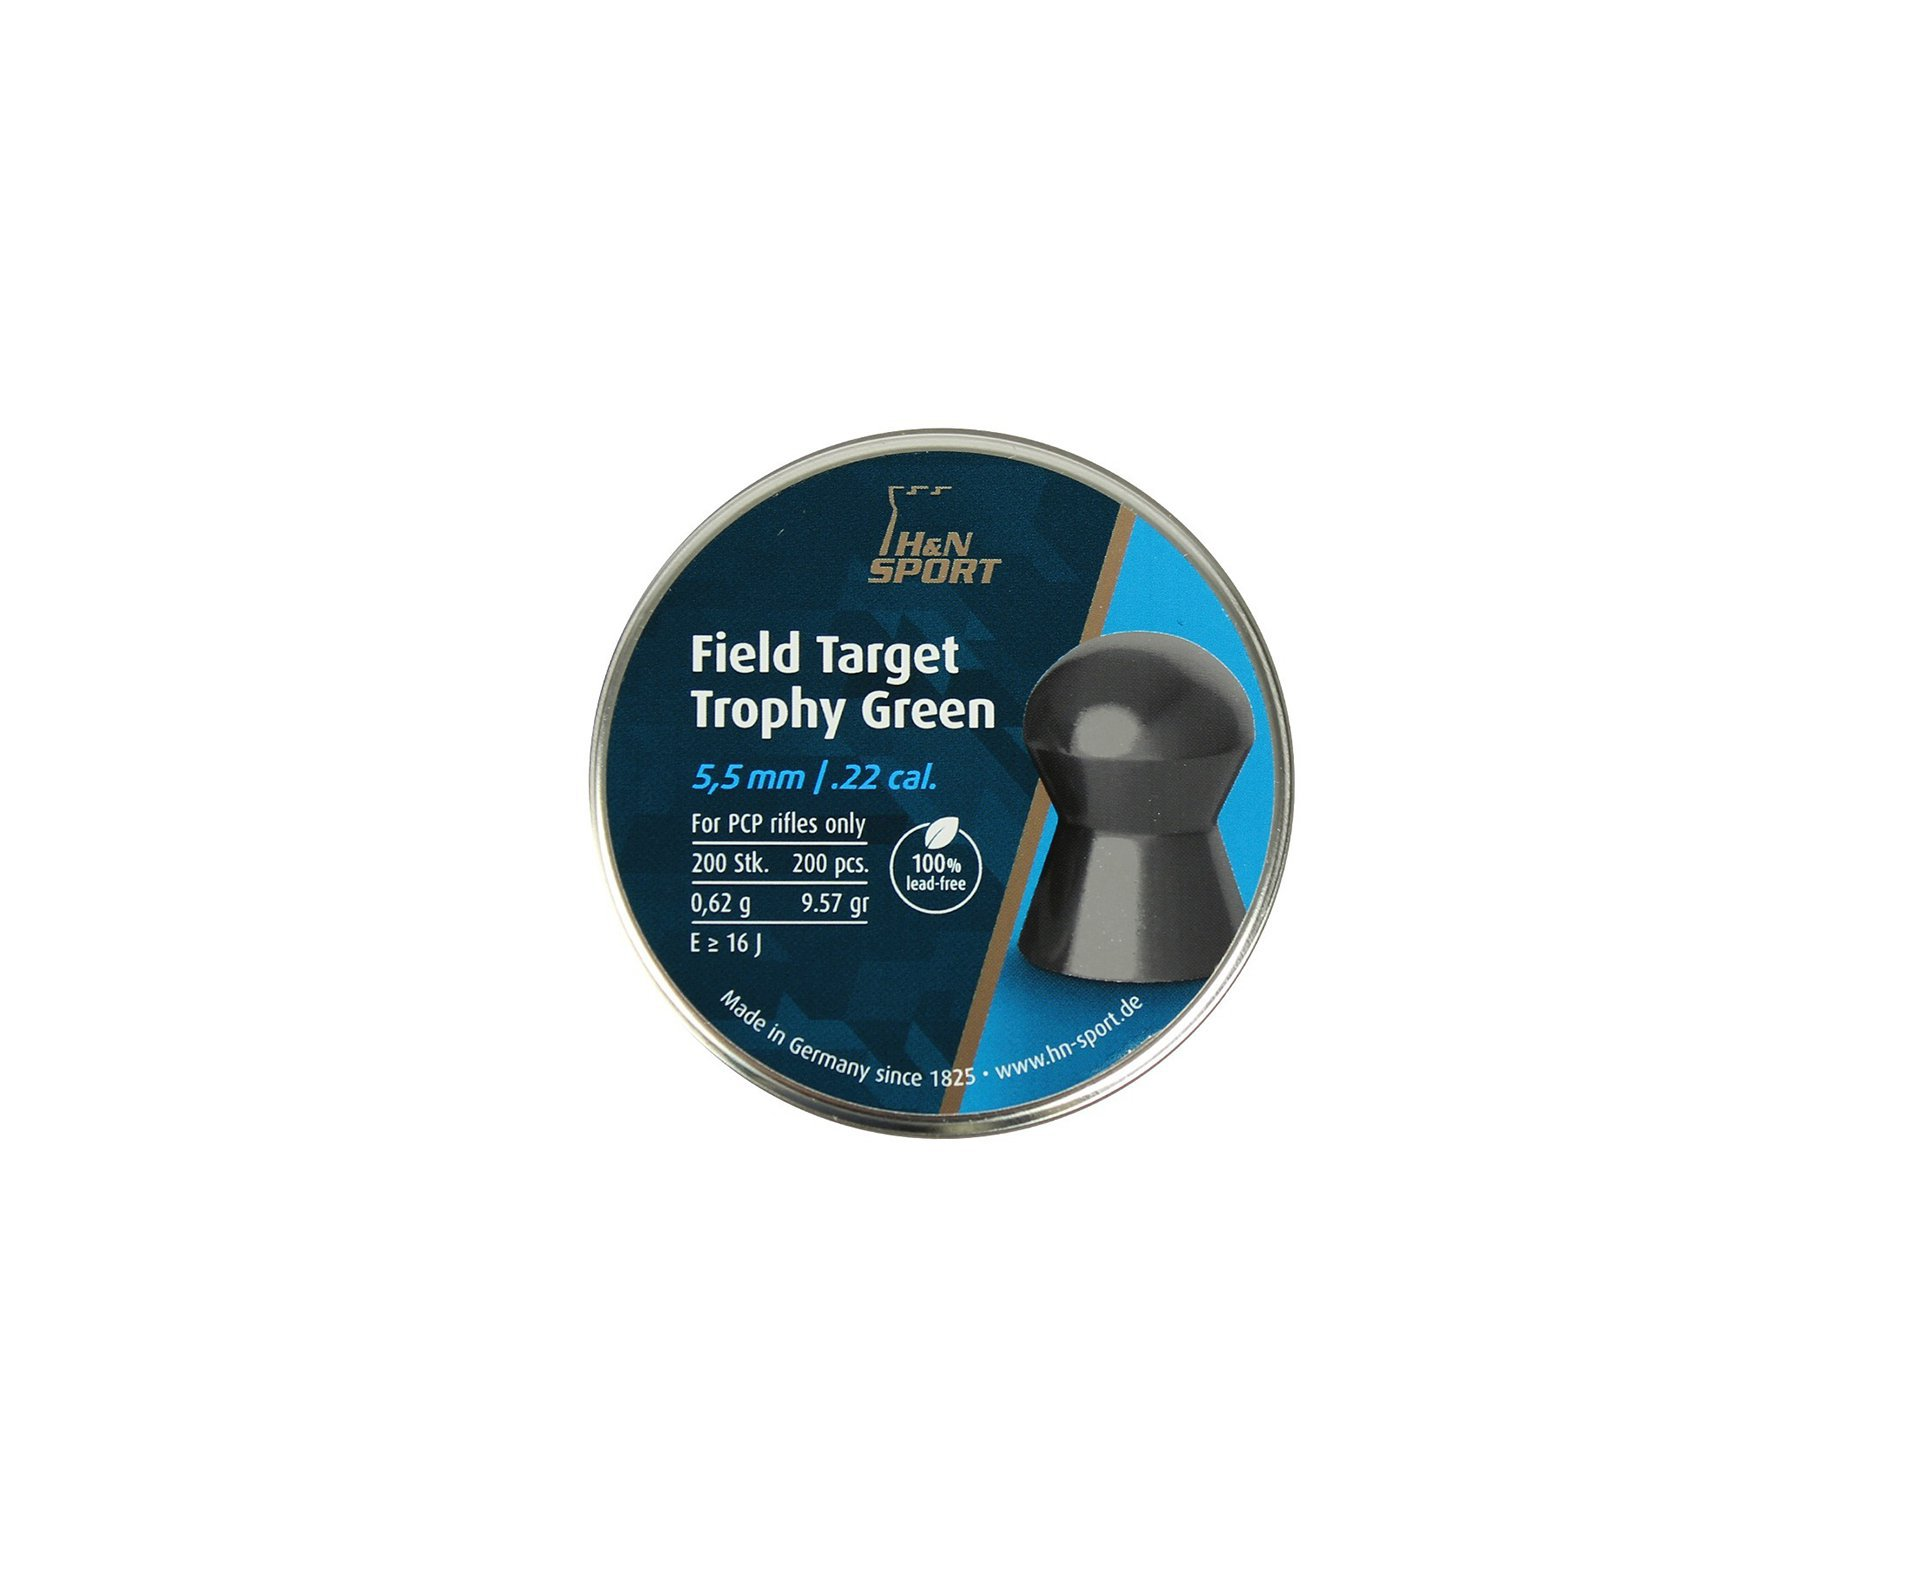 Chumbinho Profissional H&n Field Target Trophy Green 5,5mm 200uni